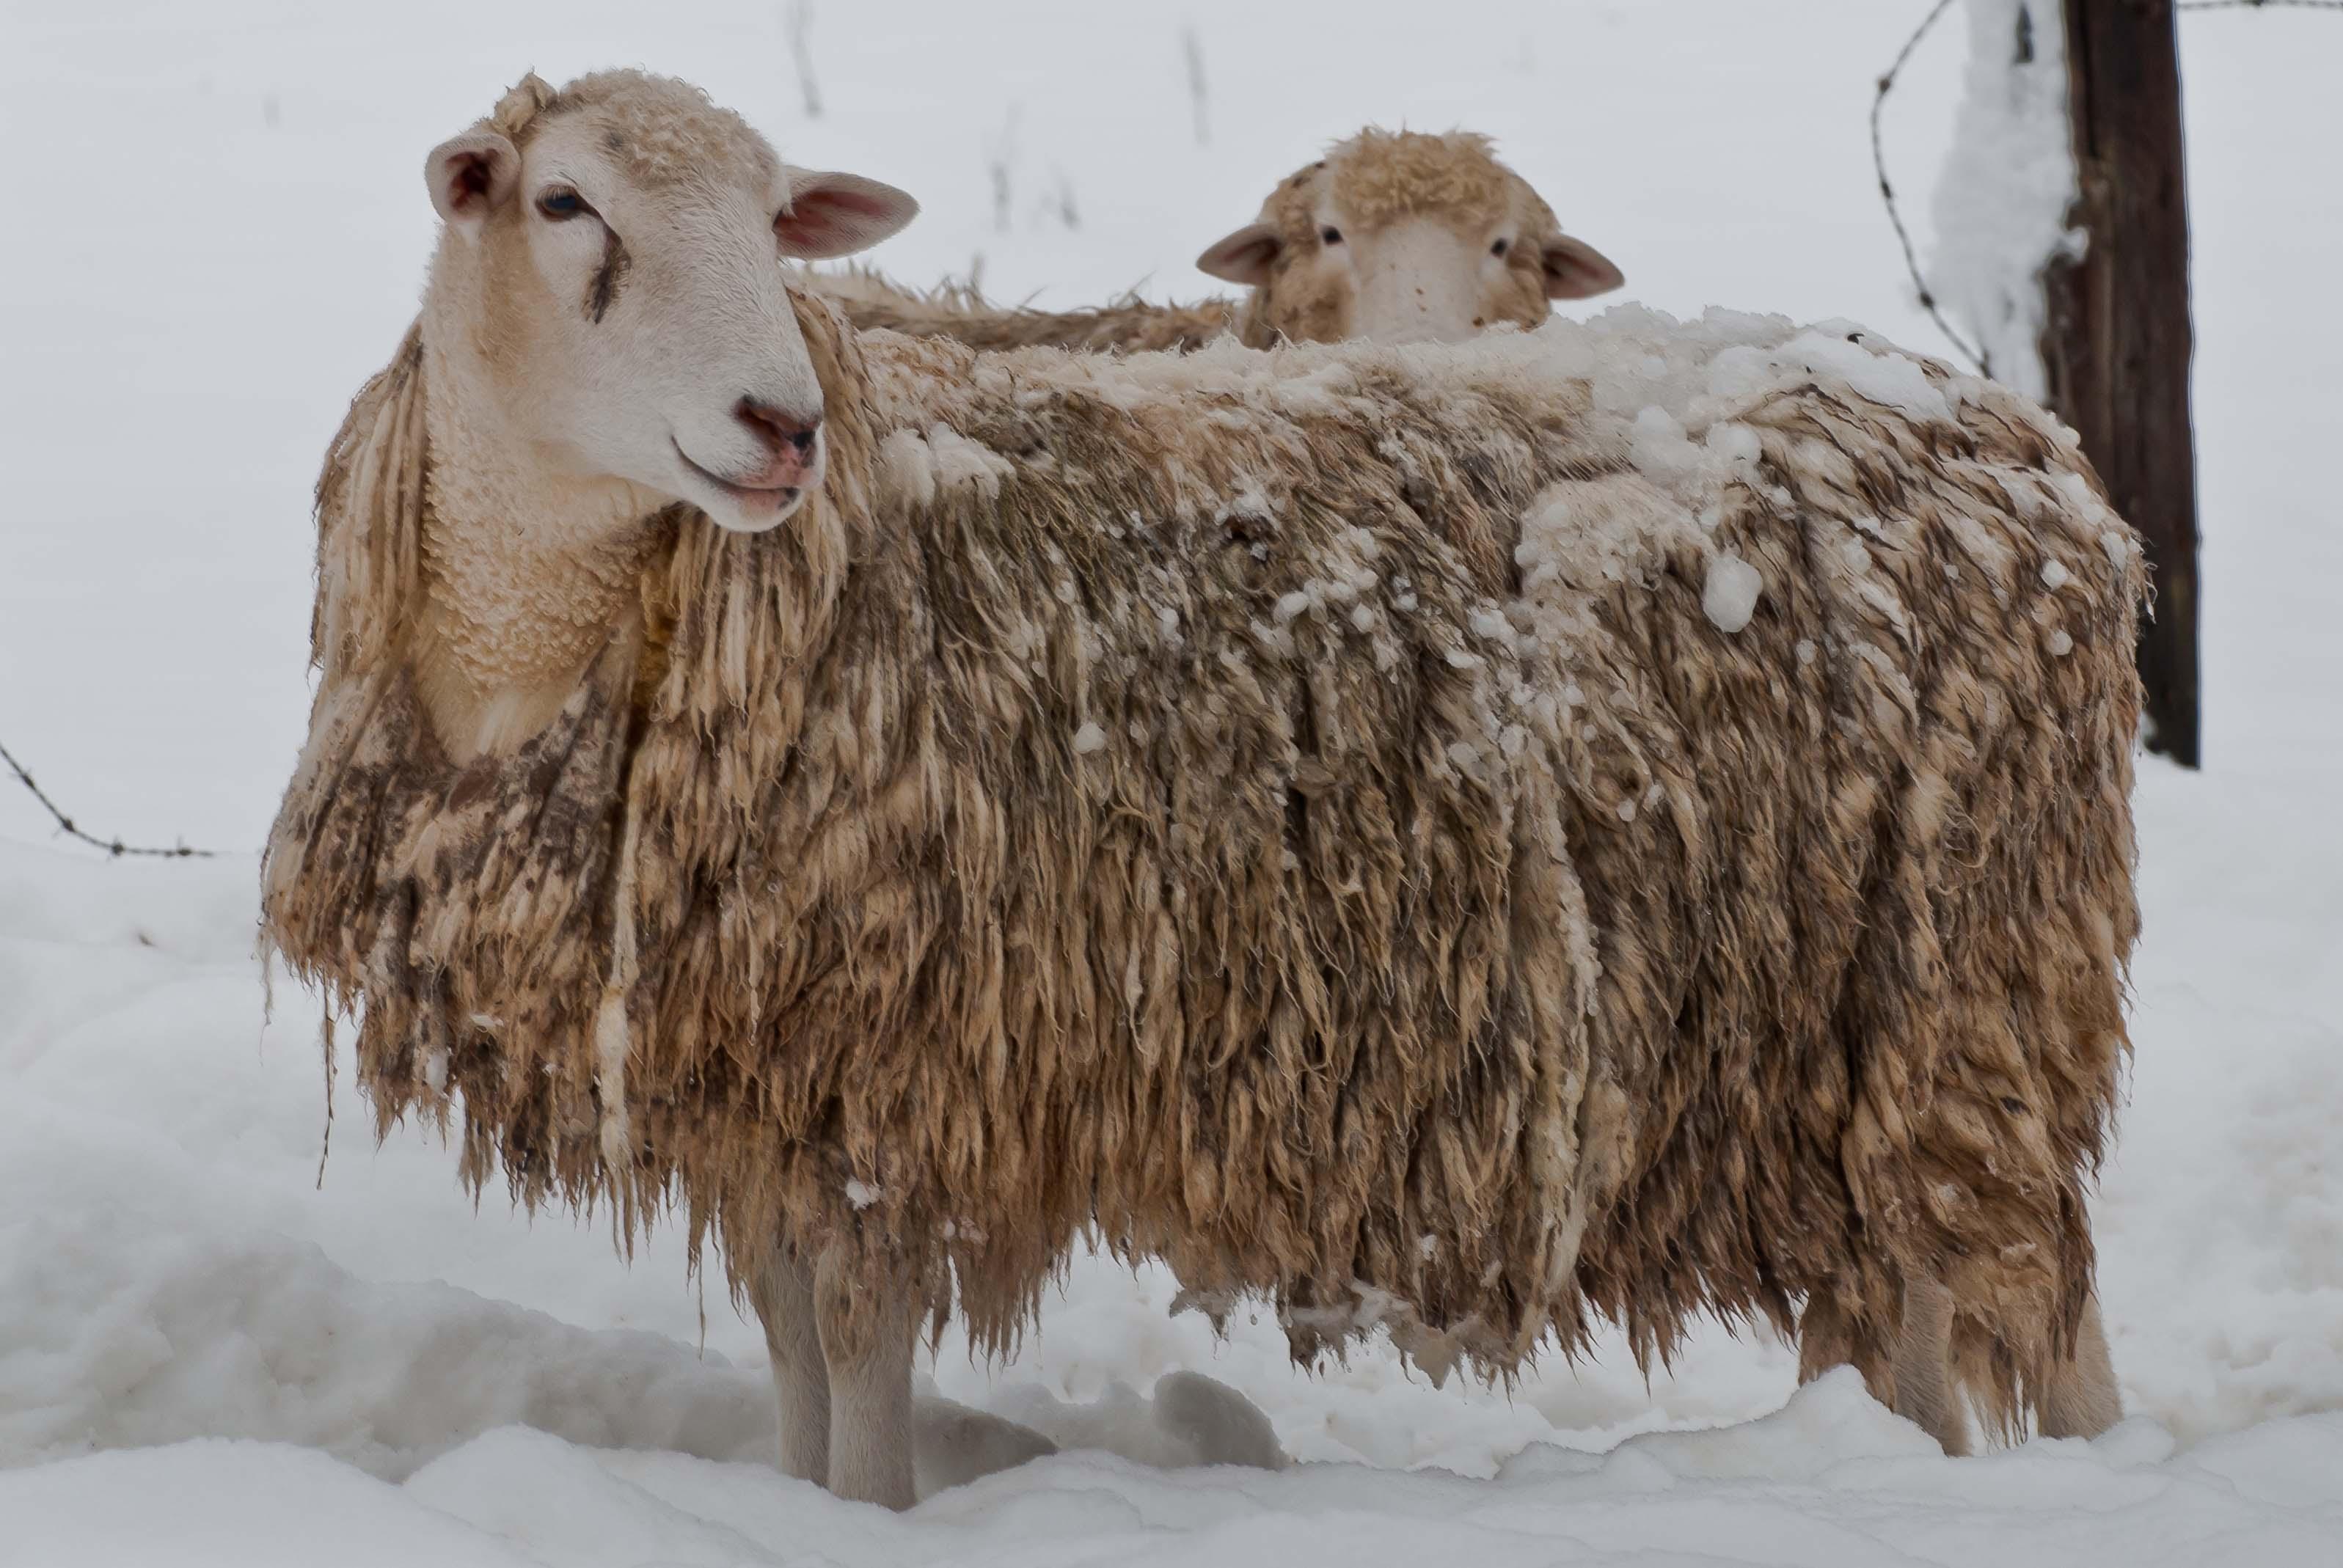 Sheep_in-winter_0565